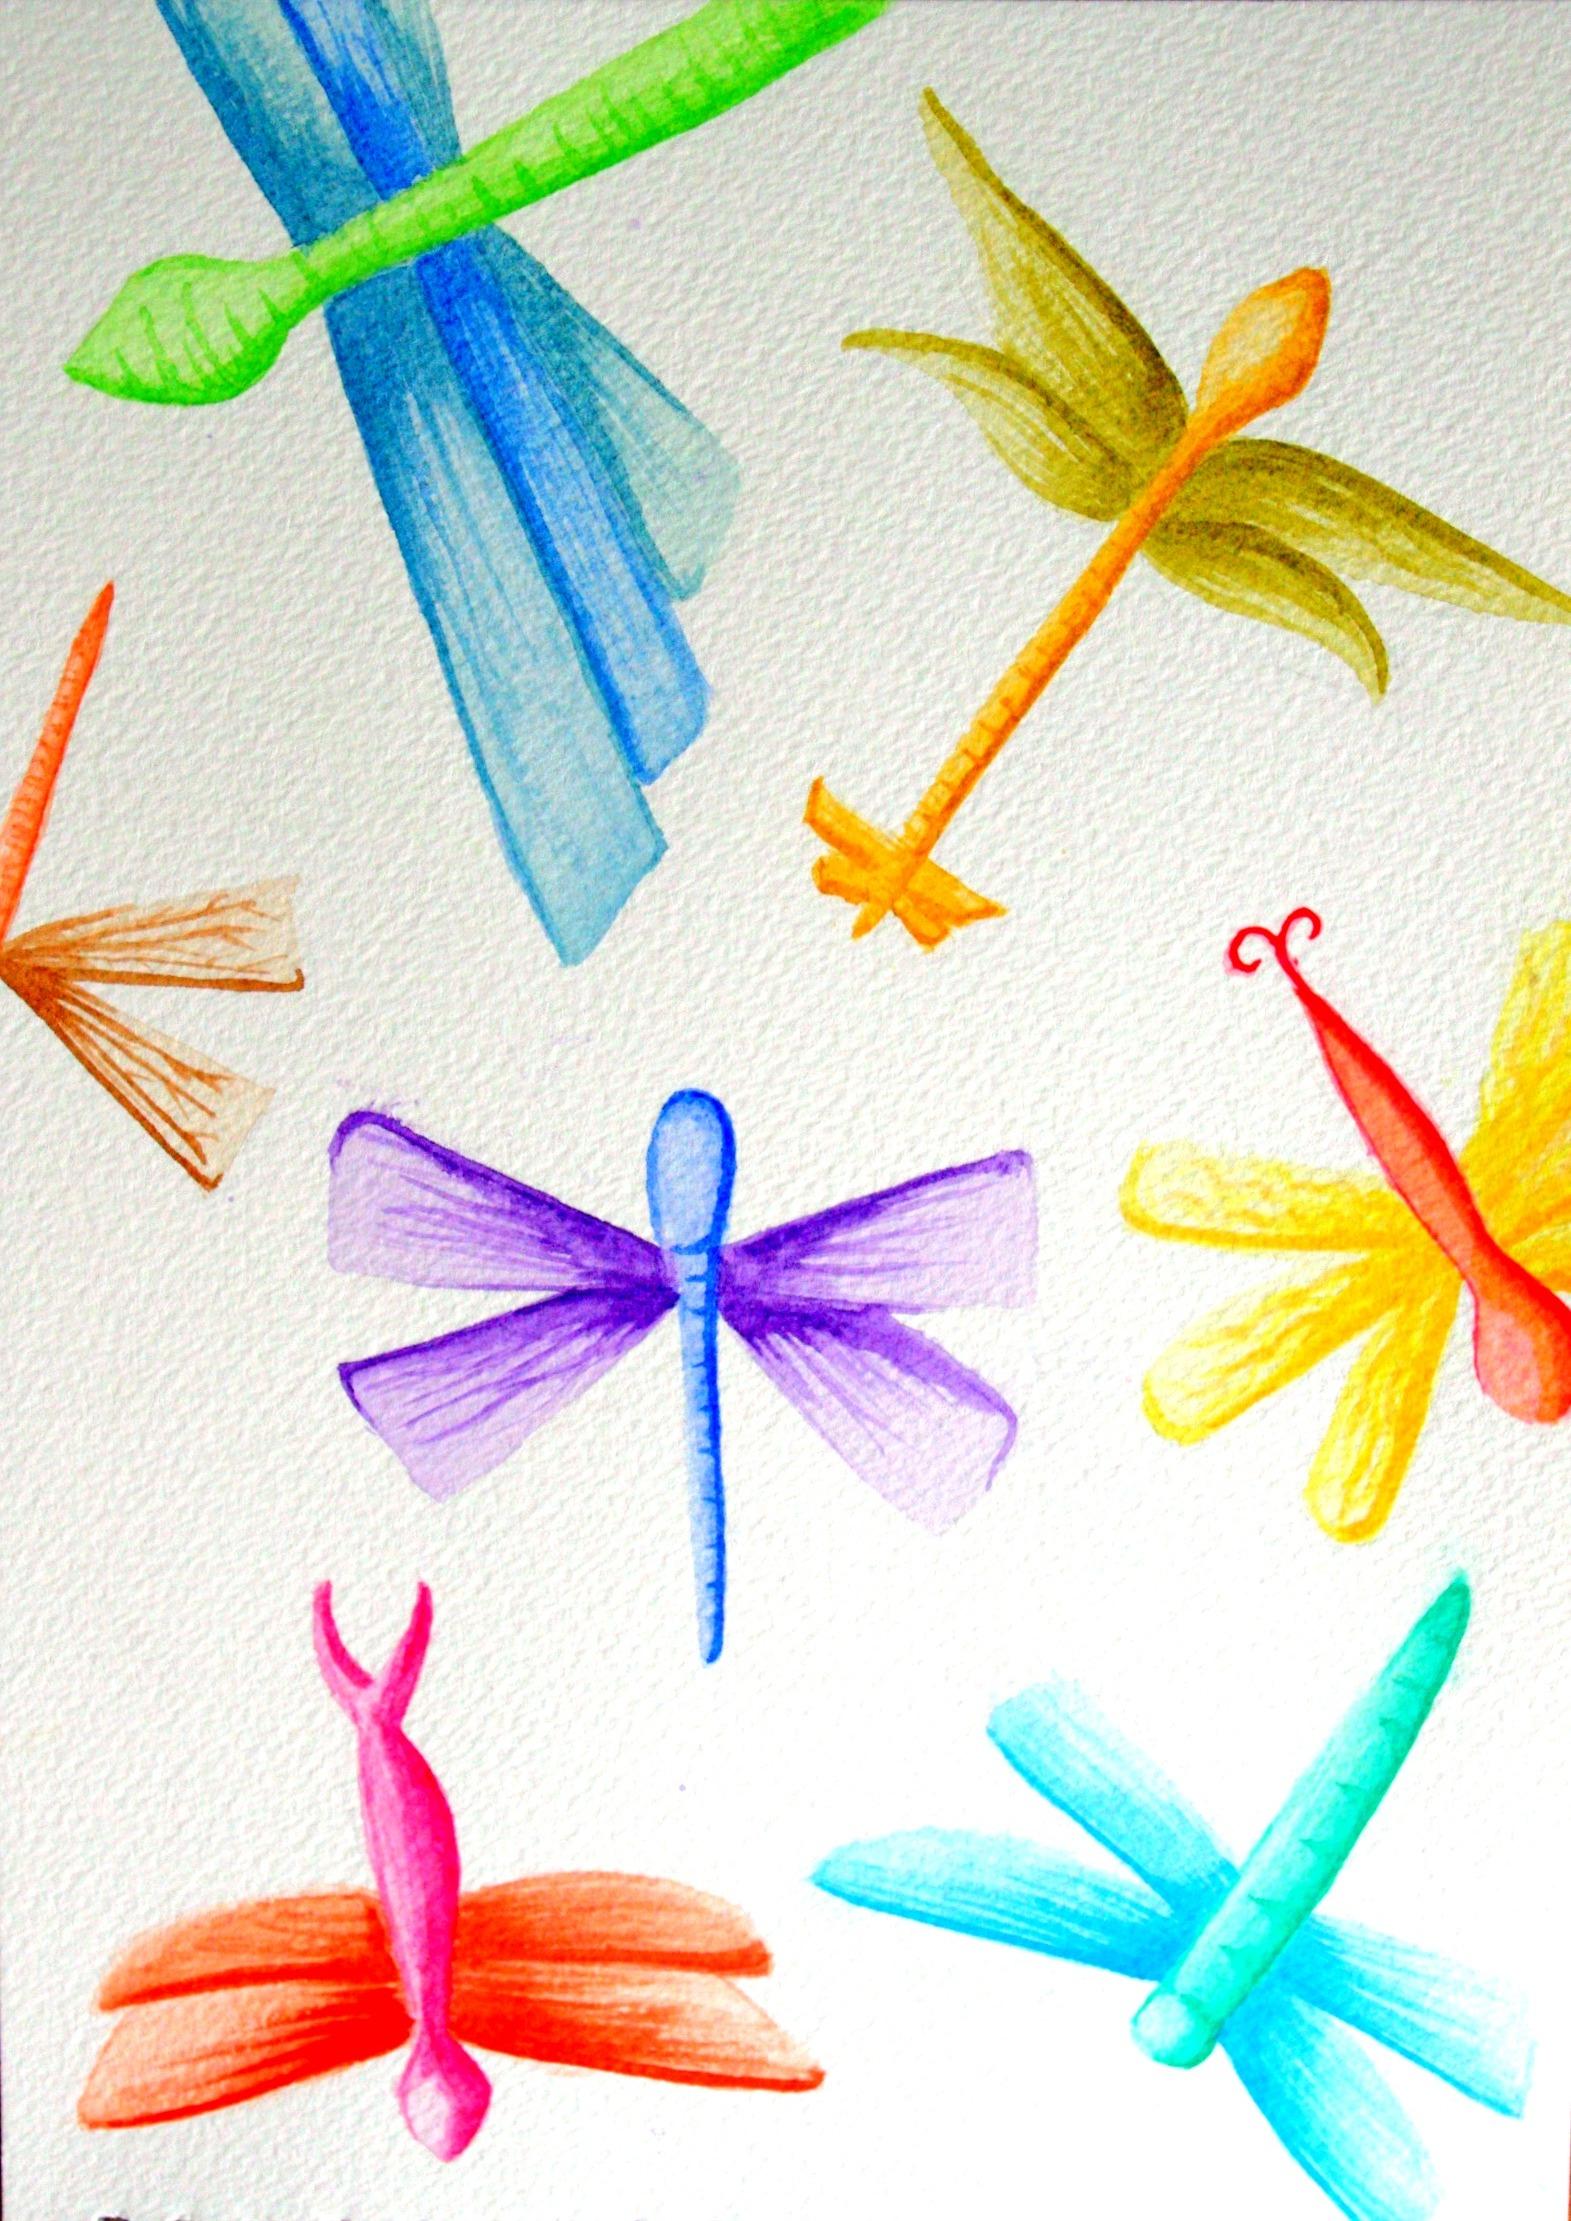 dragonfly wallpaper by oxlunaxo customization wallpaper fantasy 2011 1571x2221